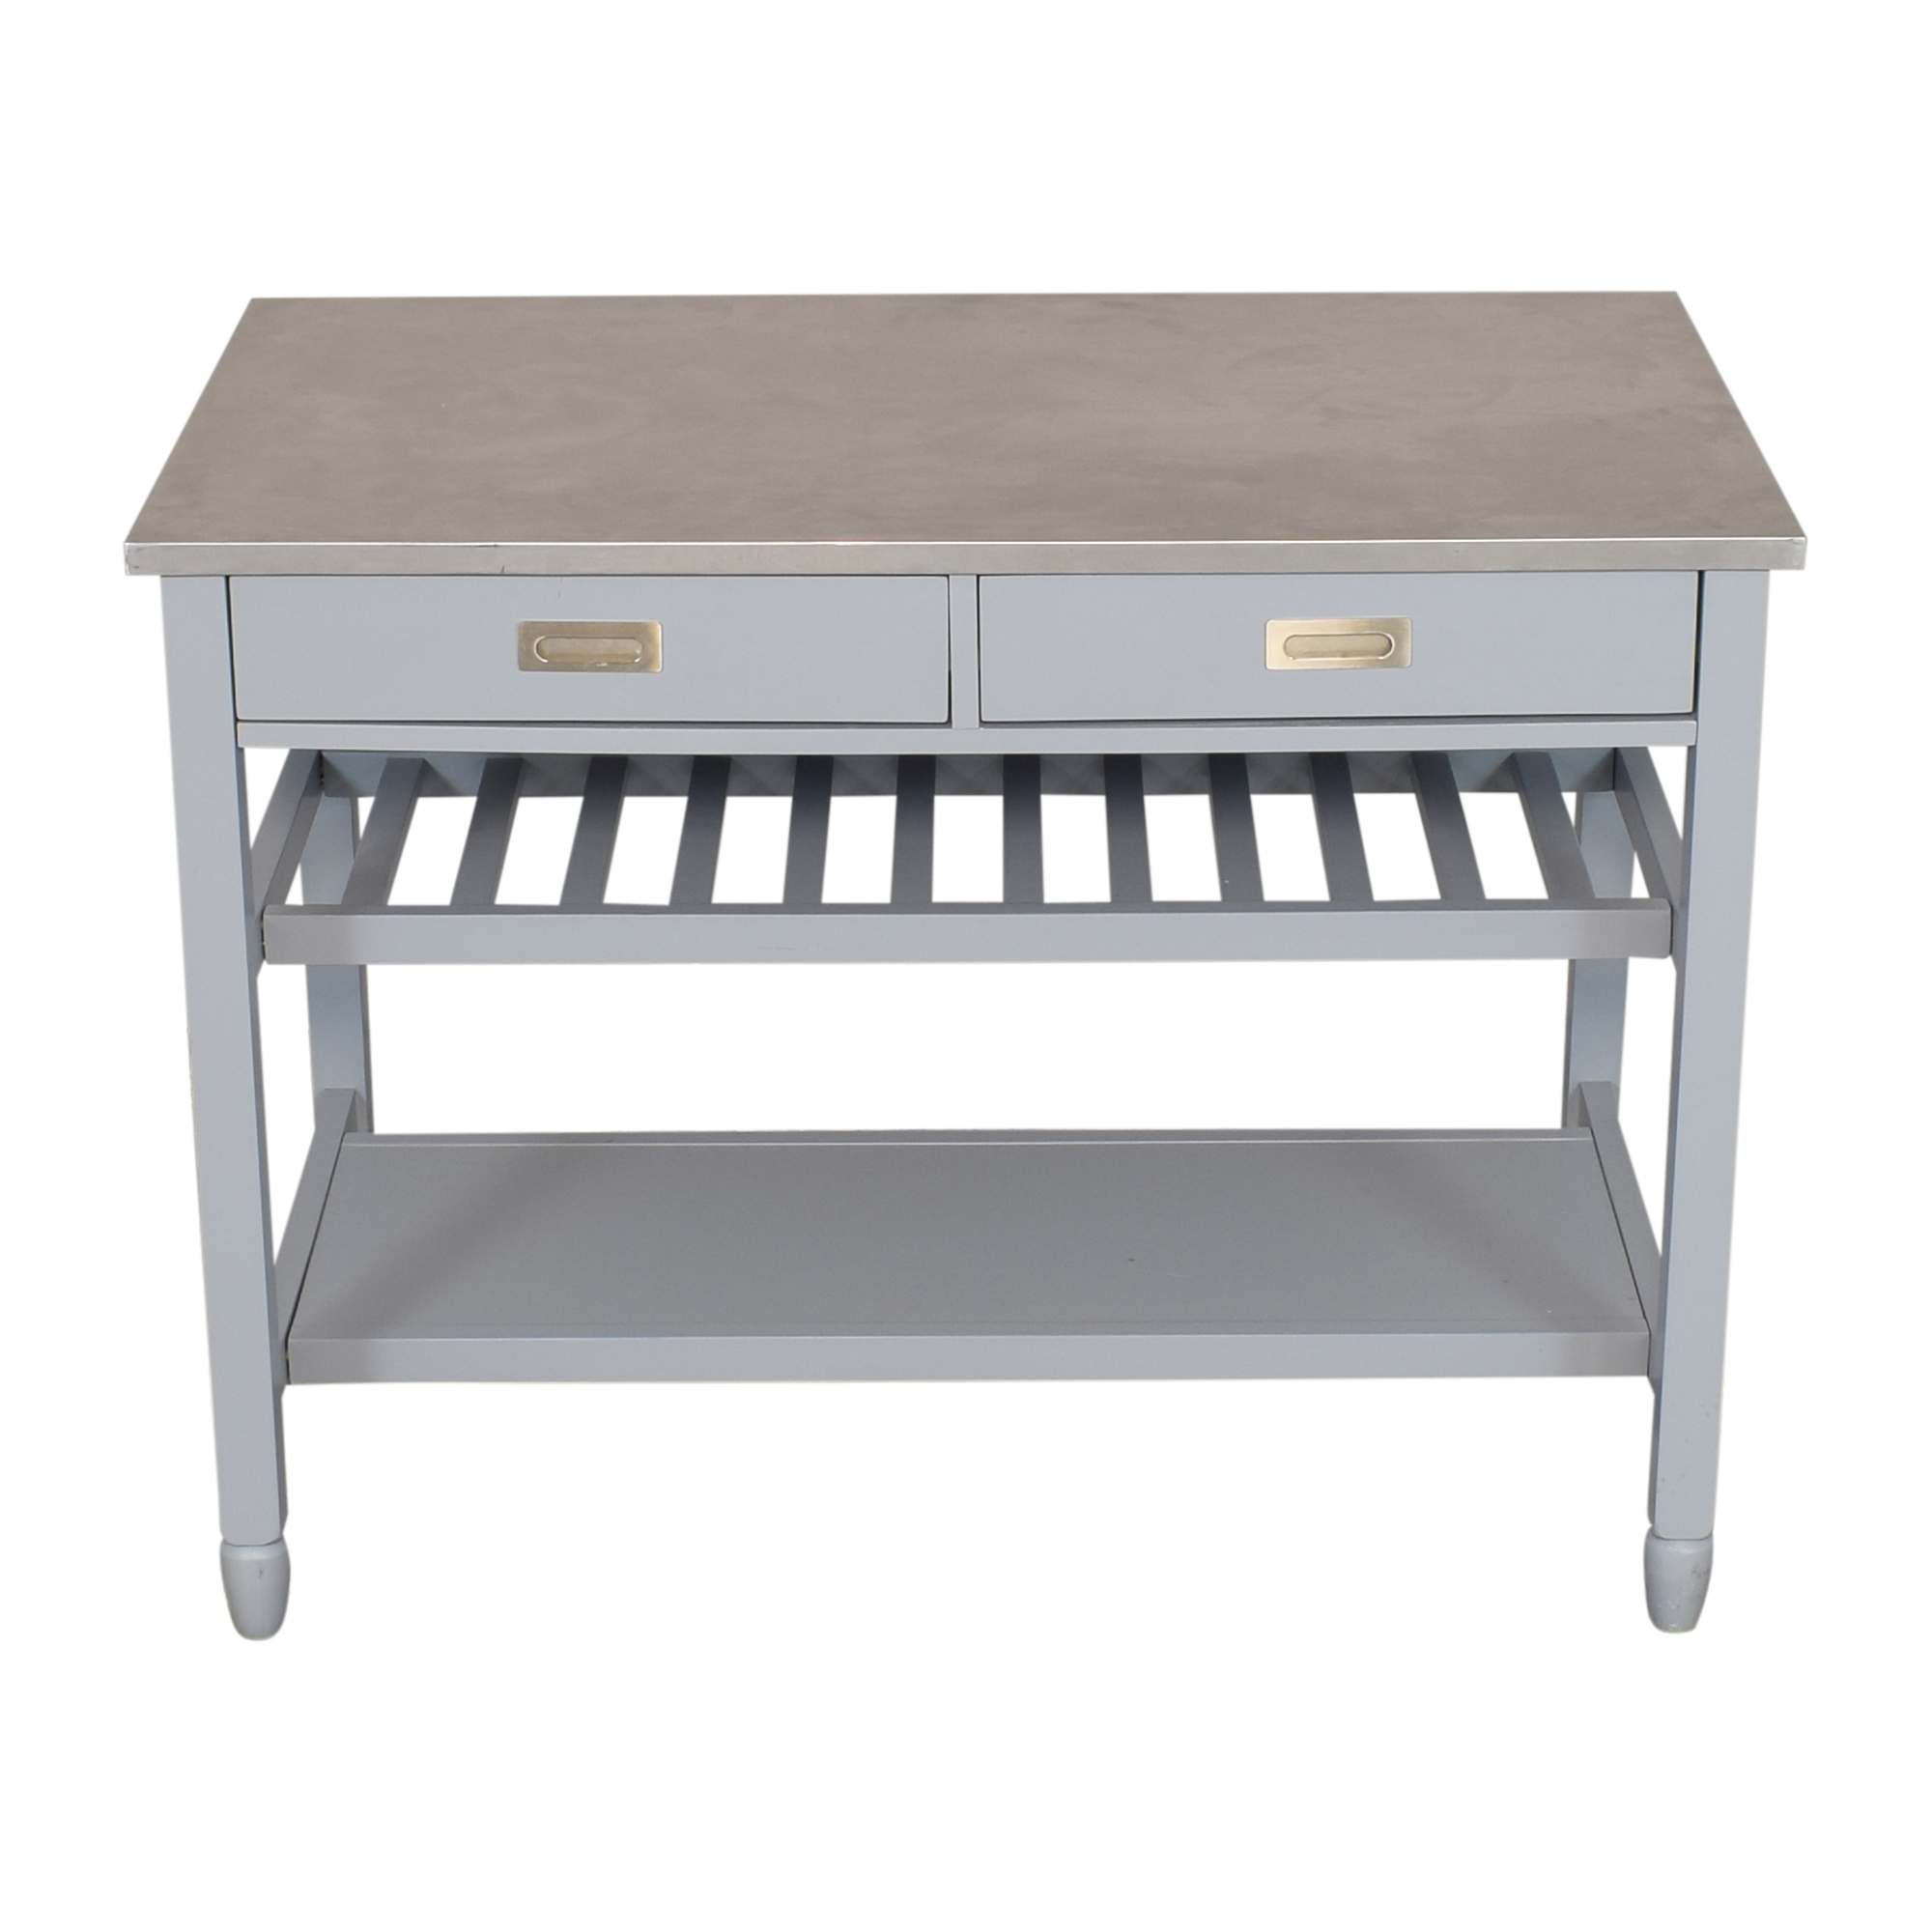 shop Crate & Barrel Sheridan Expandable Kitchen Island Crate & Barrel Utility Tables